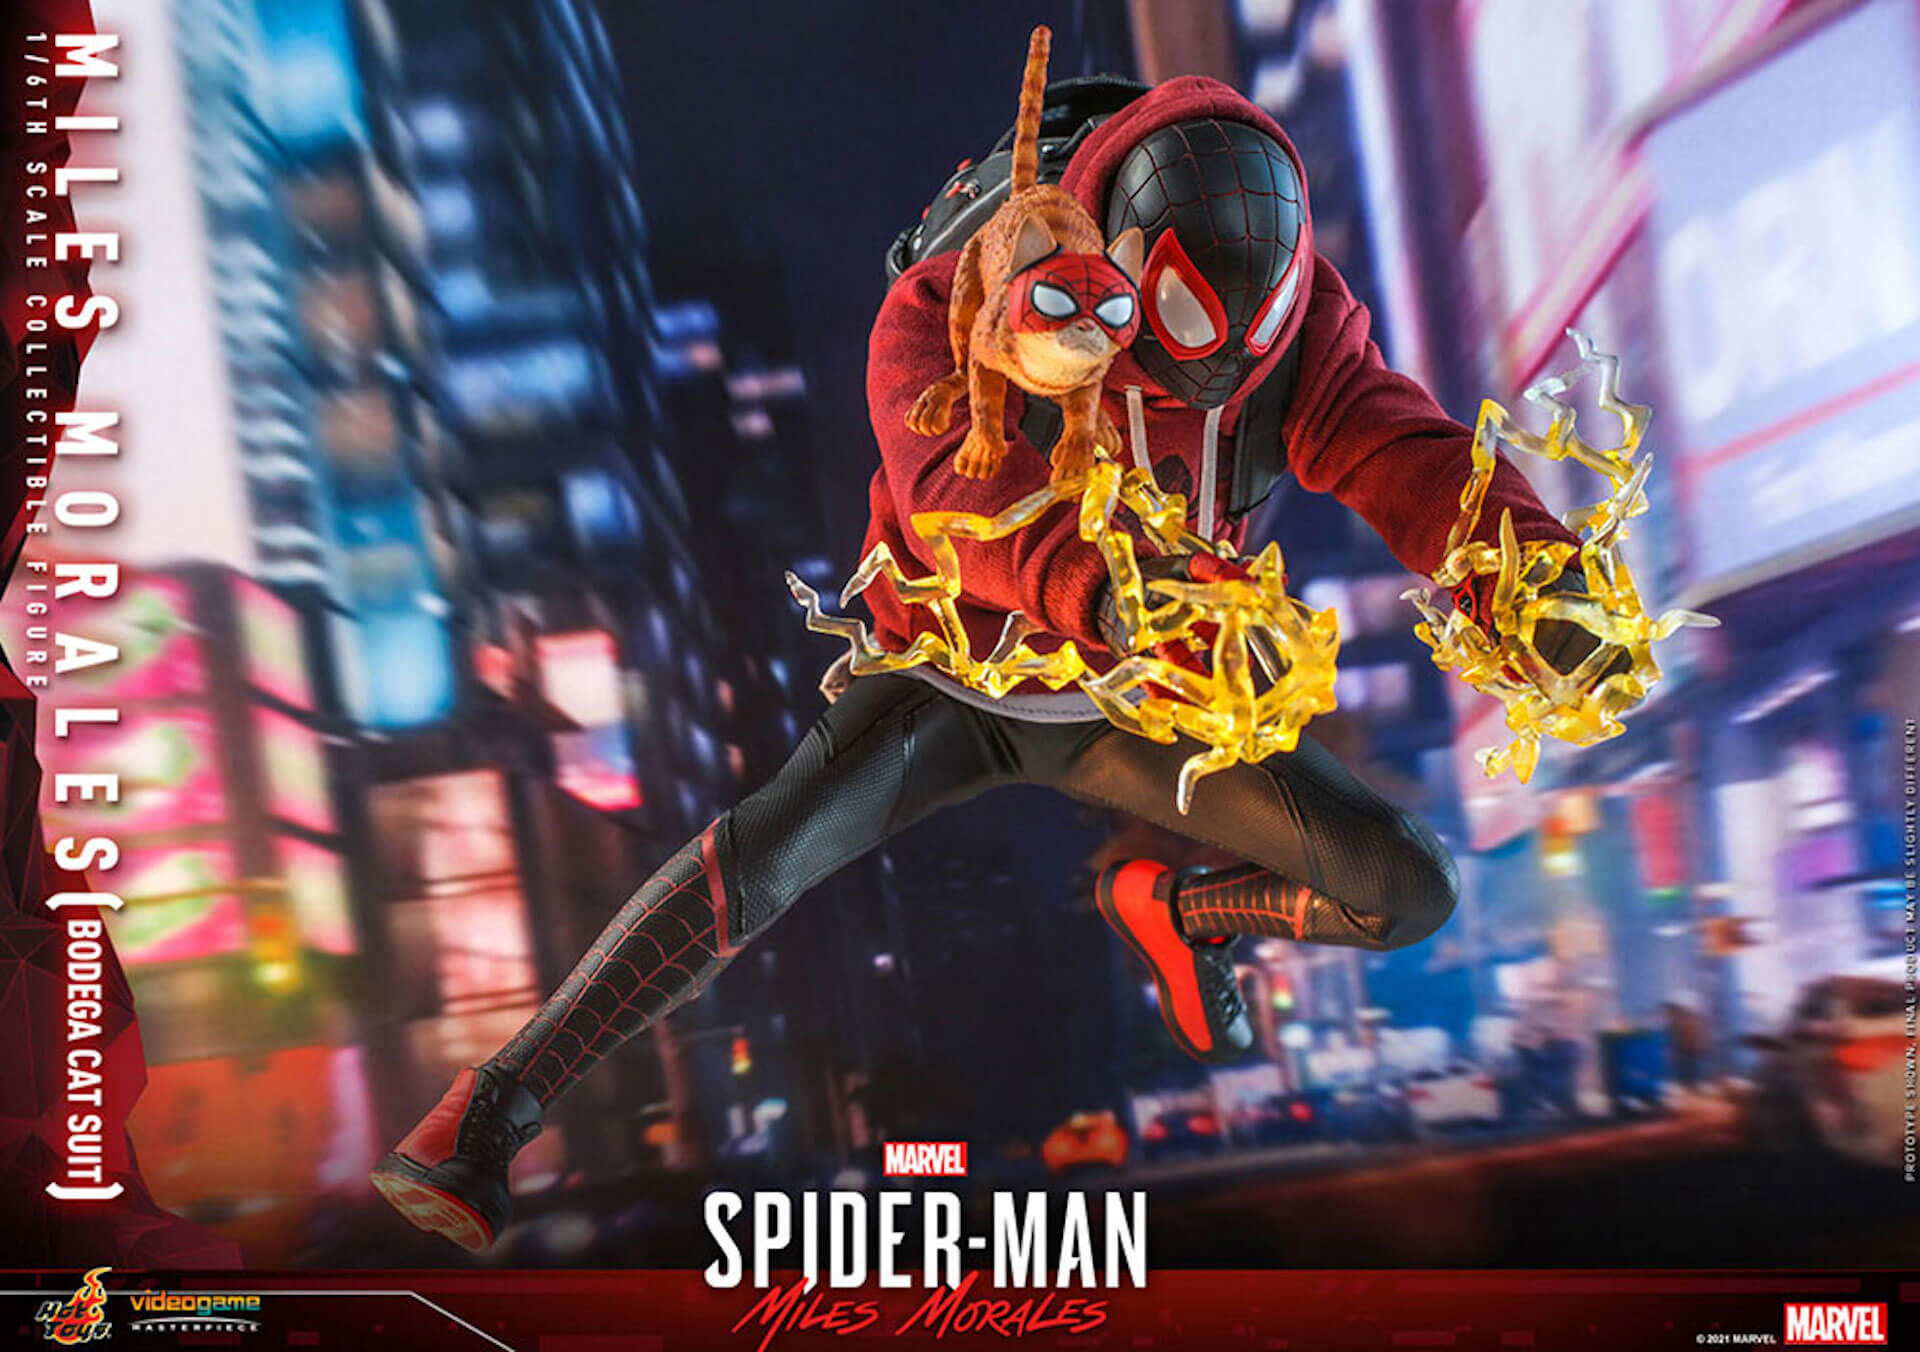 『Marvel's Spider-Man:Miles Morales』のスパイダーマンがホットトイズで超精巧なフィギュアになって登場! art210601_spiderman_hottoys_8